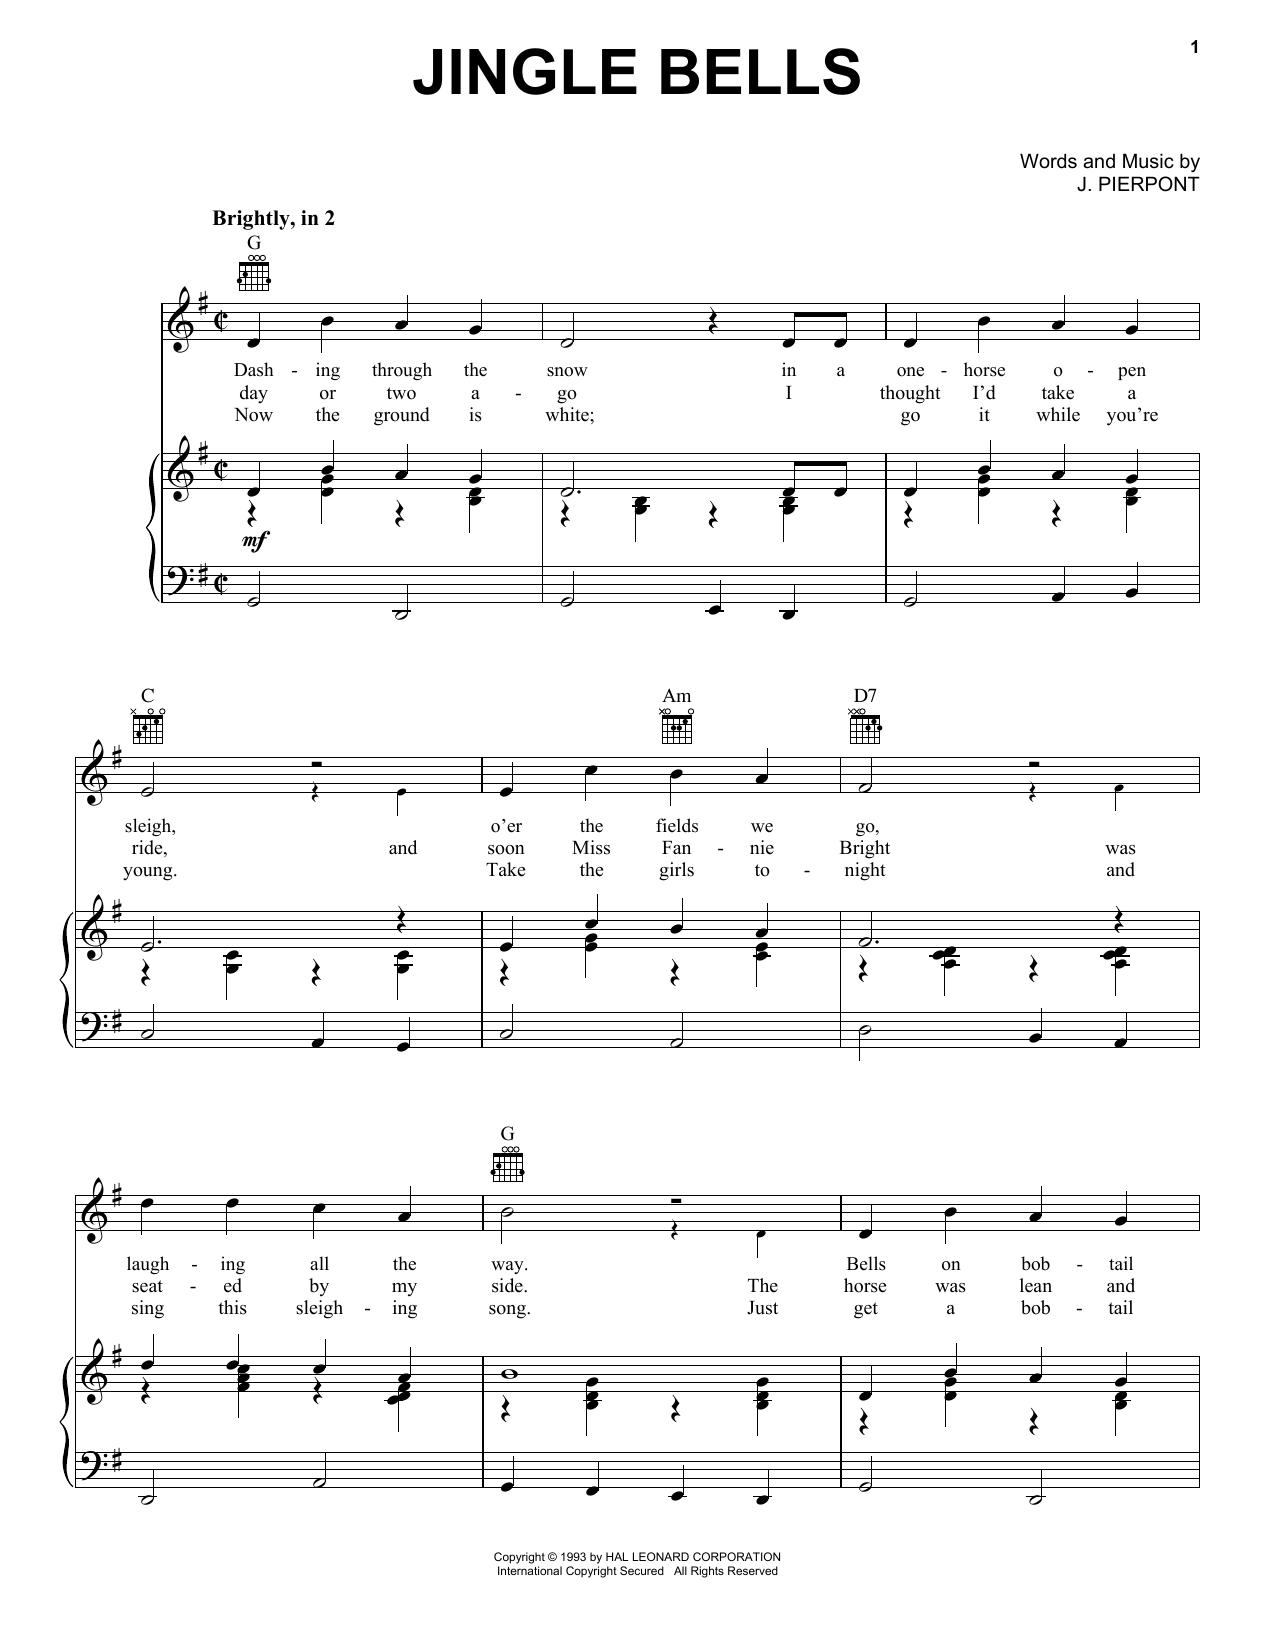 J. Pierpont Jingle Bells sheet music notes and chords. Download Printable PDF.